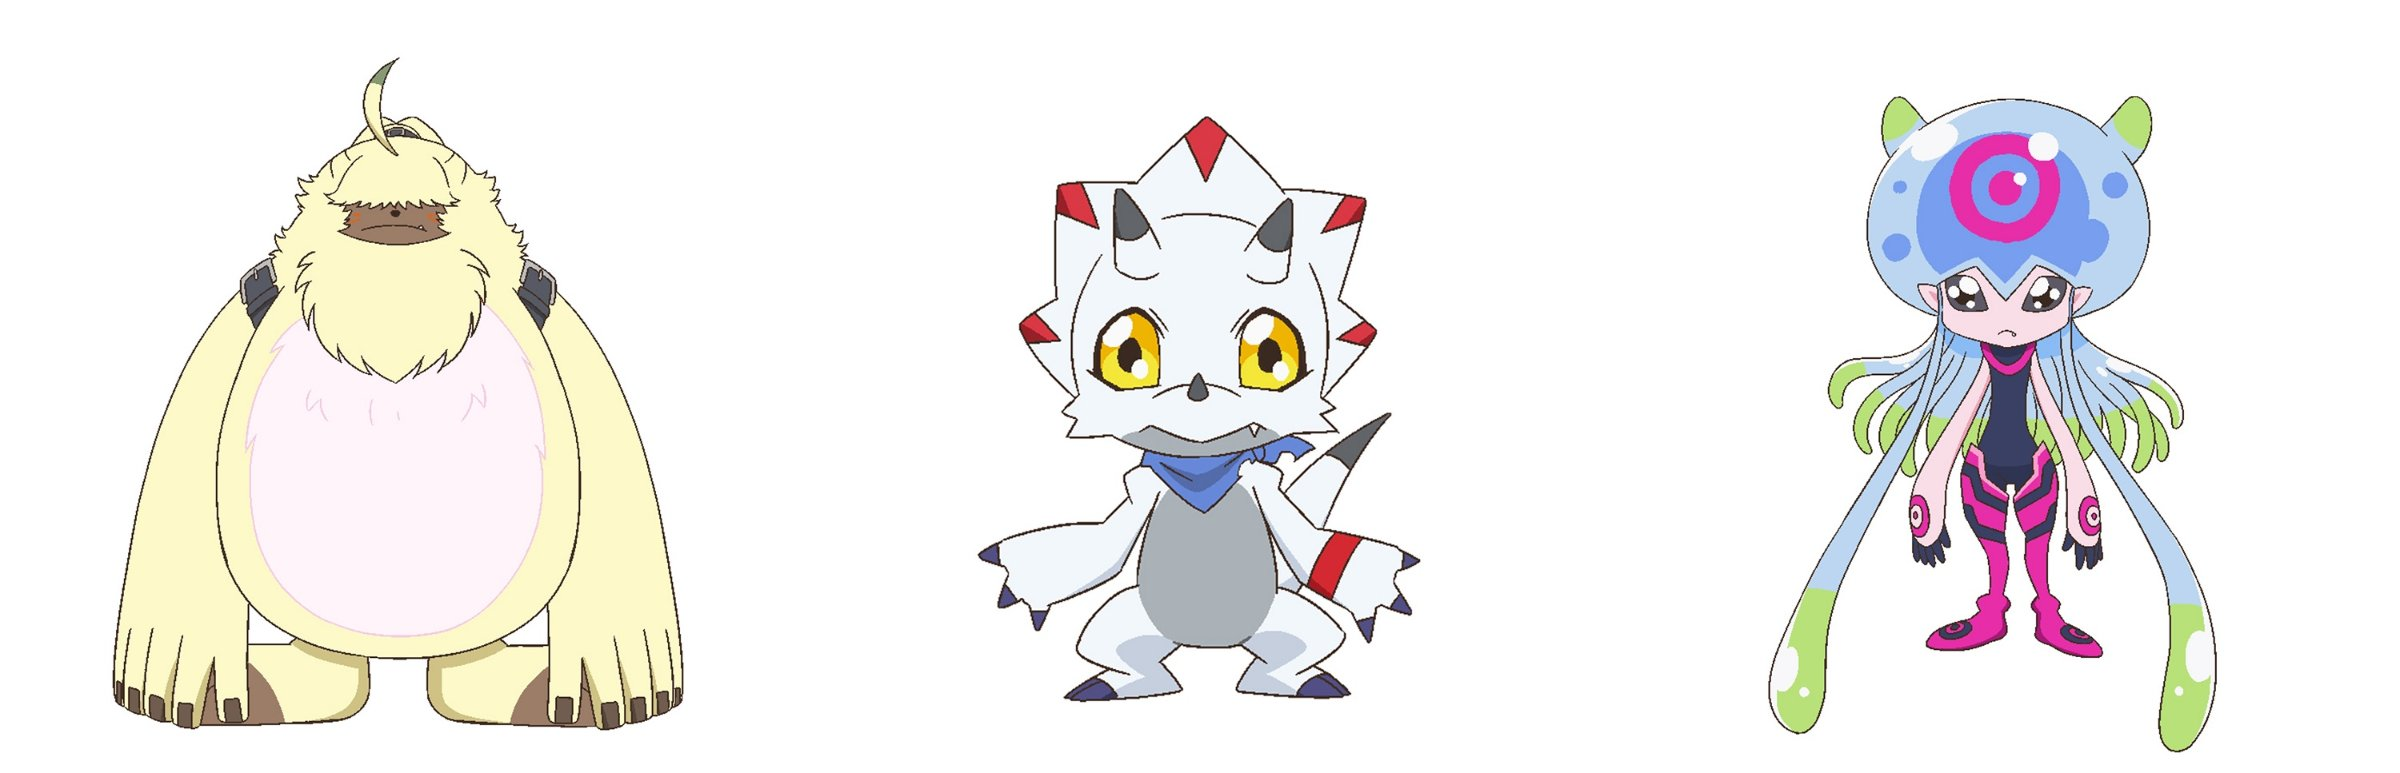 ghostgamedigimon_august1_2021.jpg